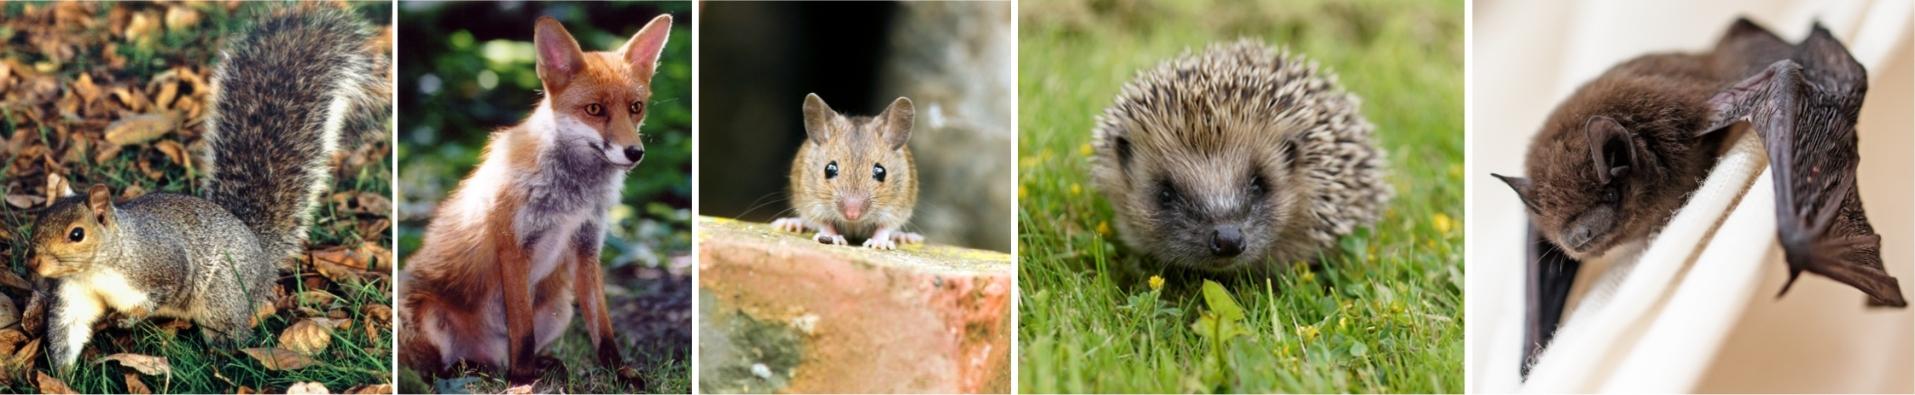 endangered mammal species